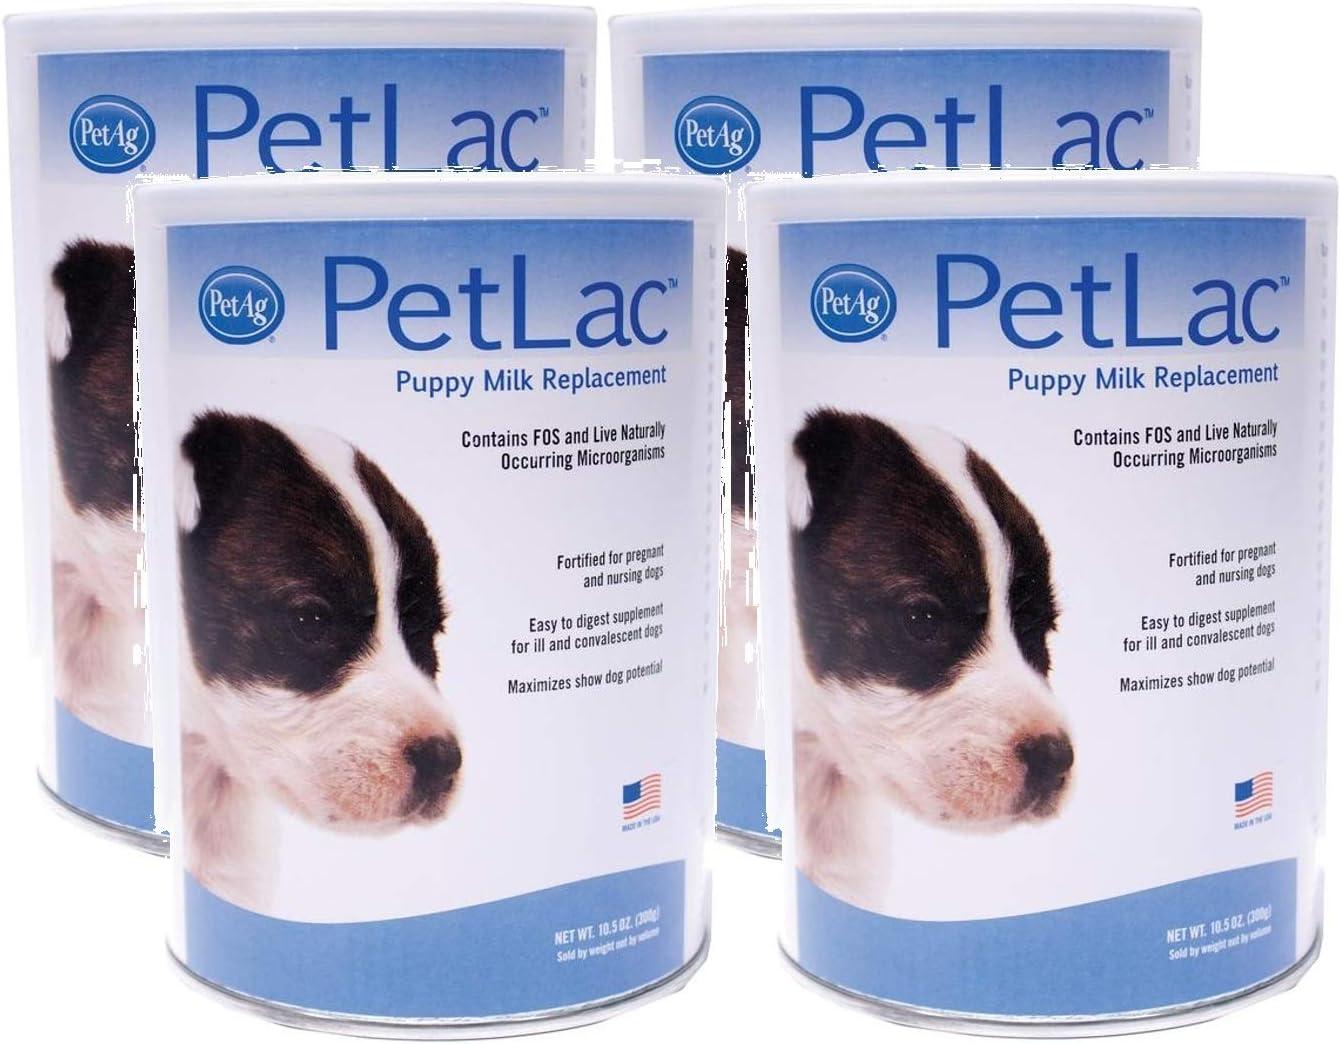 Pet Ag 4 Pack Kansas New popularity City Mall PetLac 10.5-Ounces Each Milk Puppies Powder